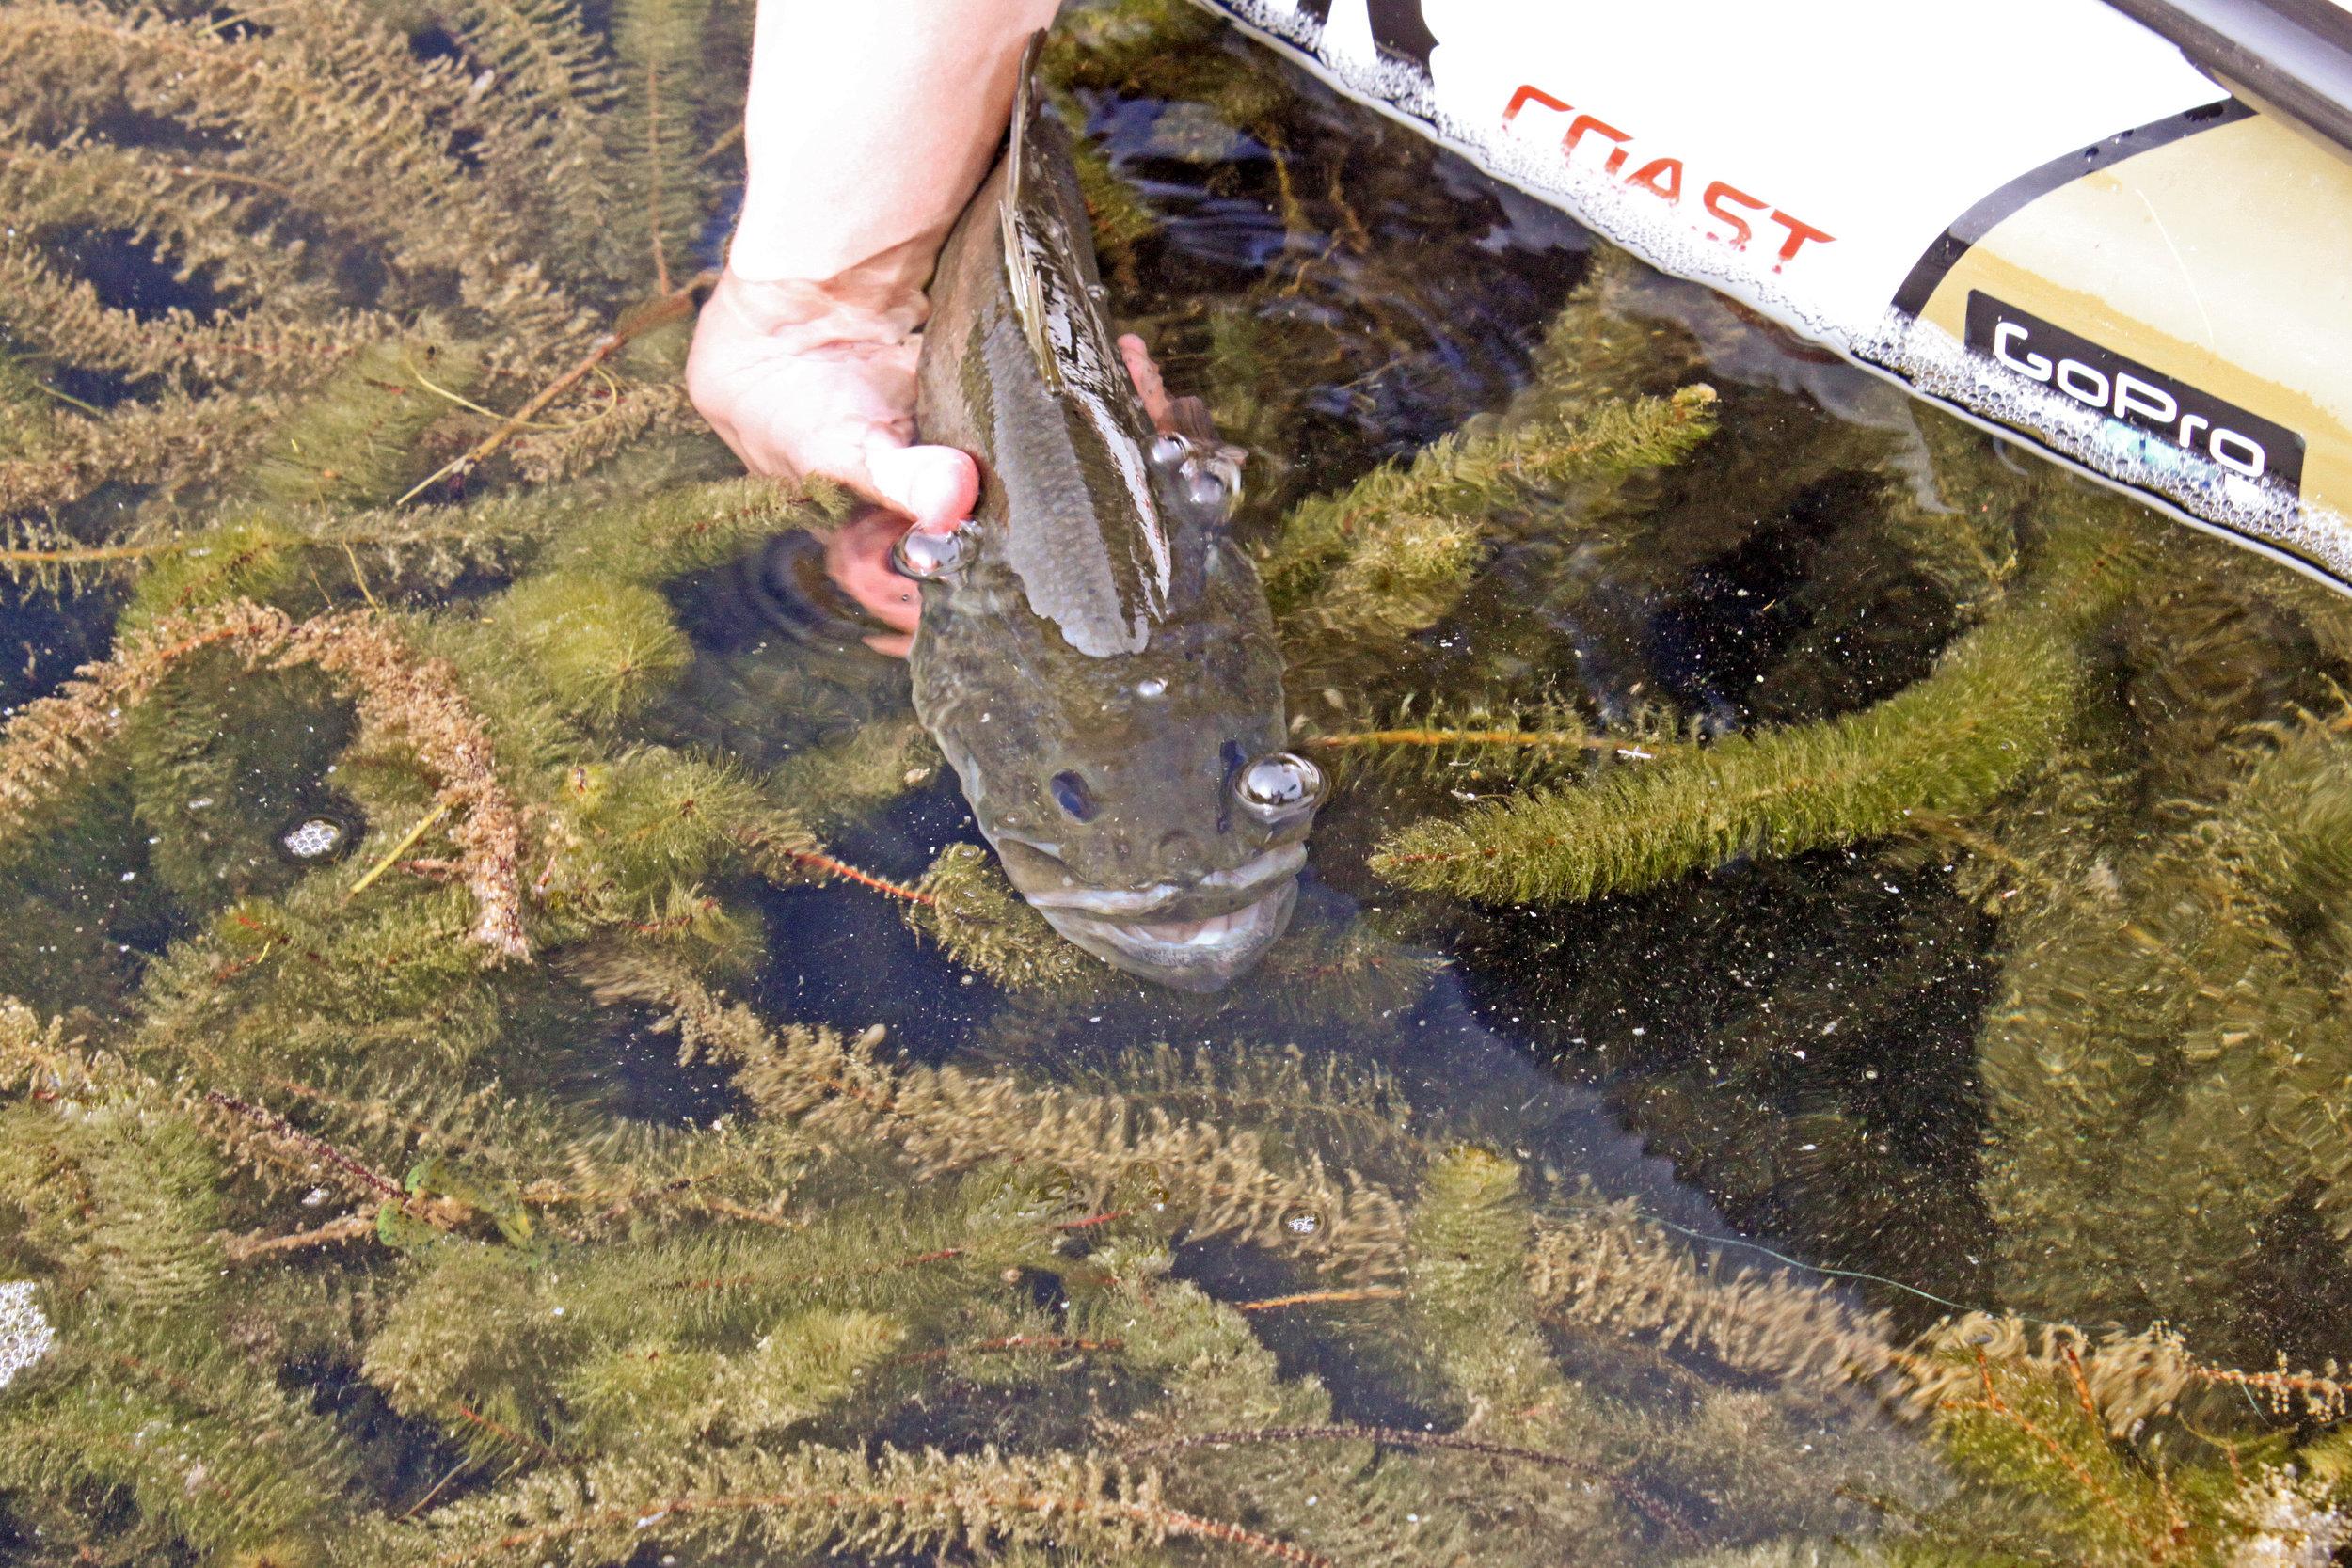 Devils River Largemouth Bass